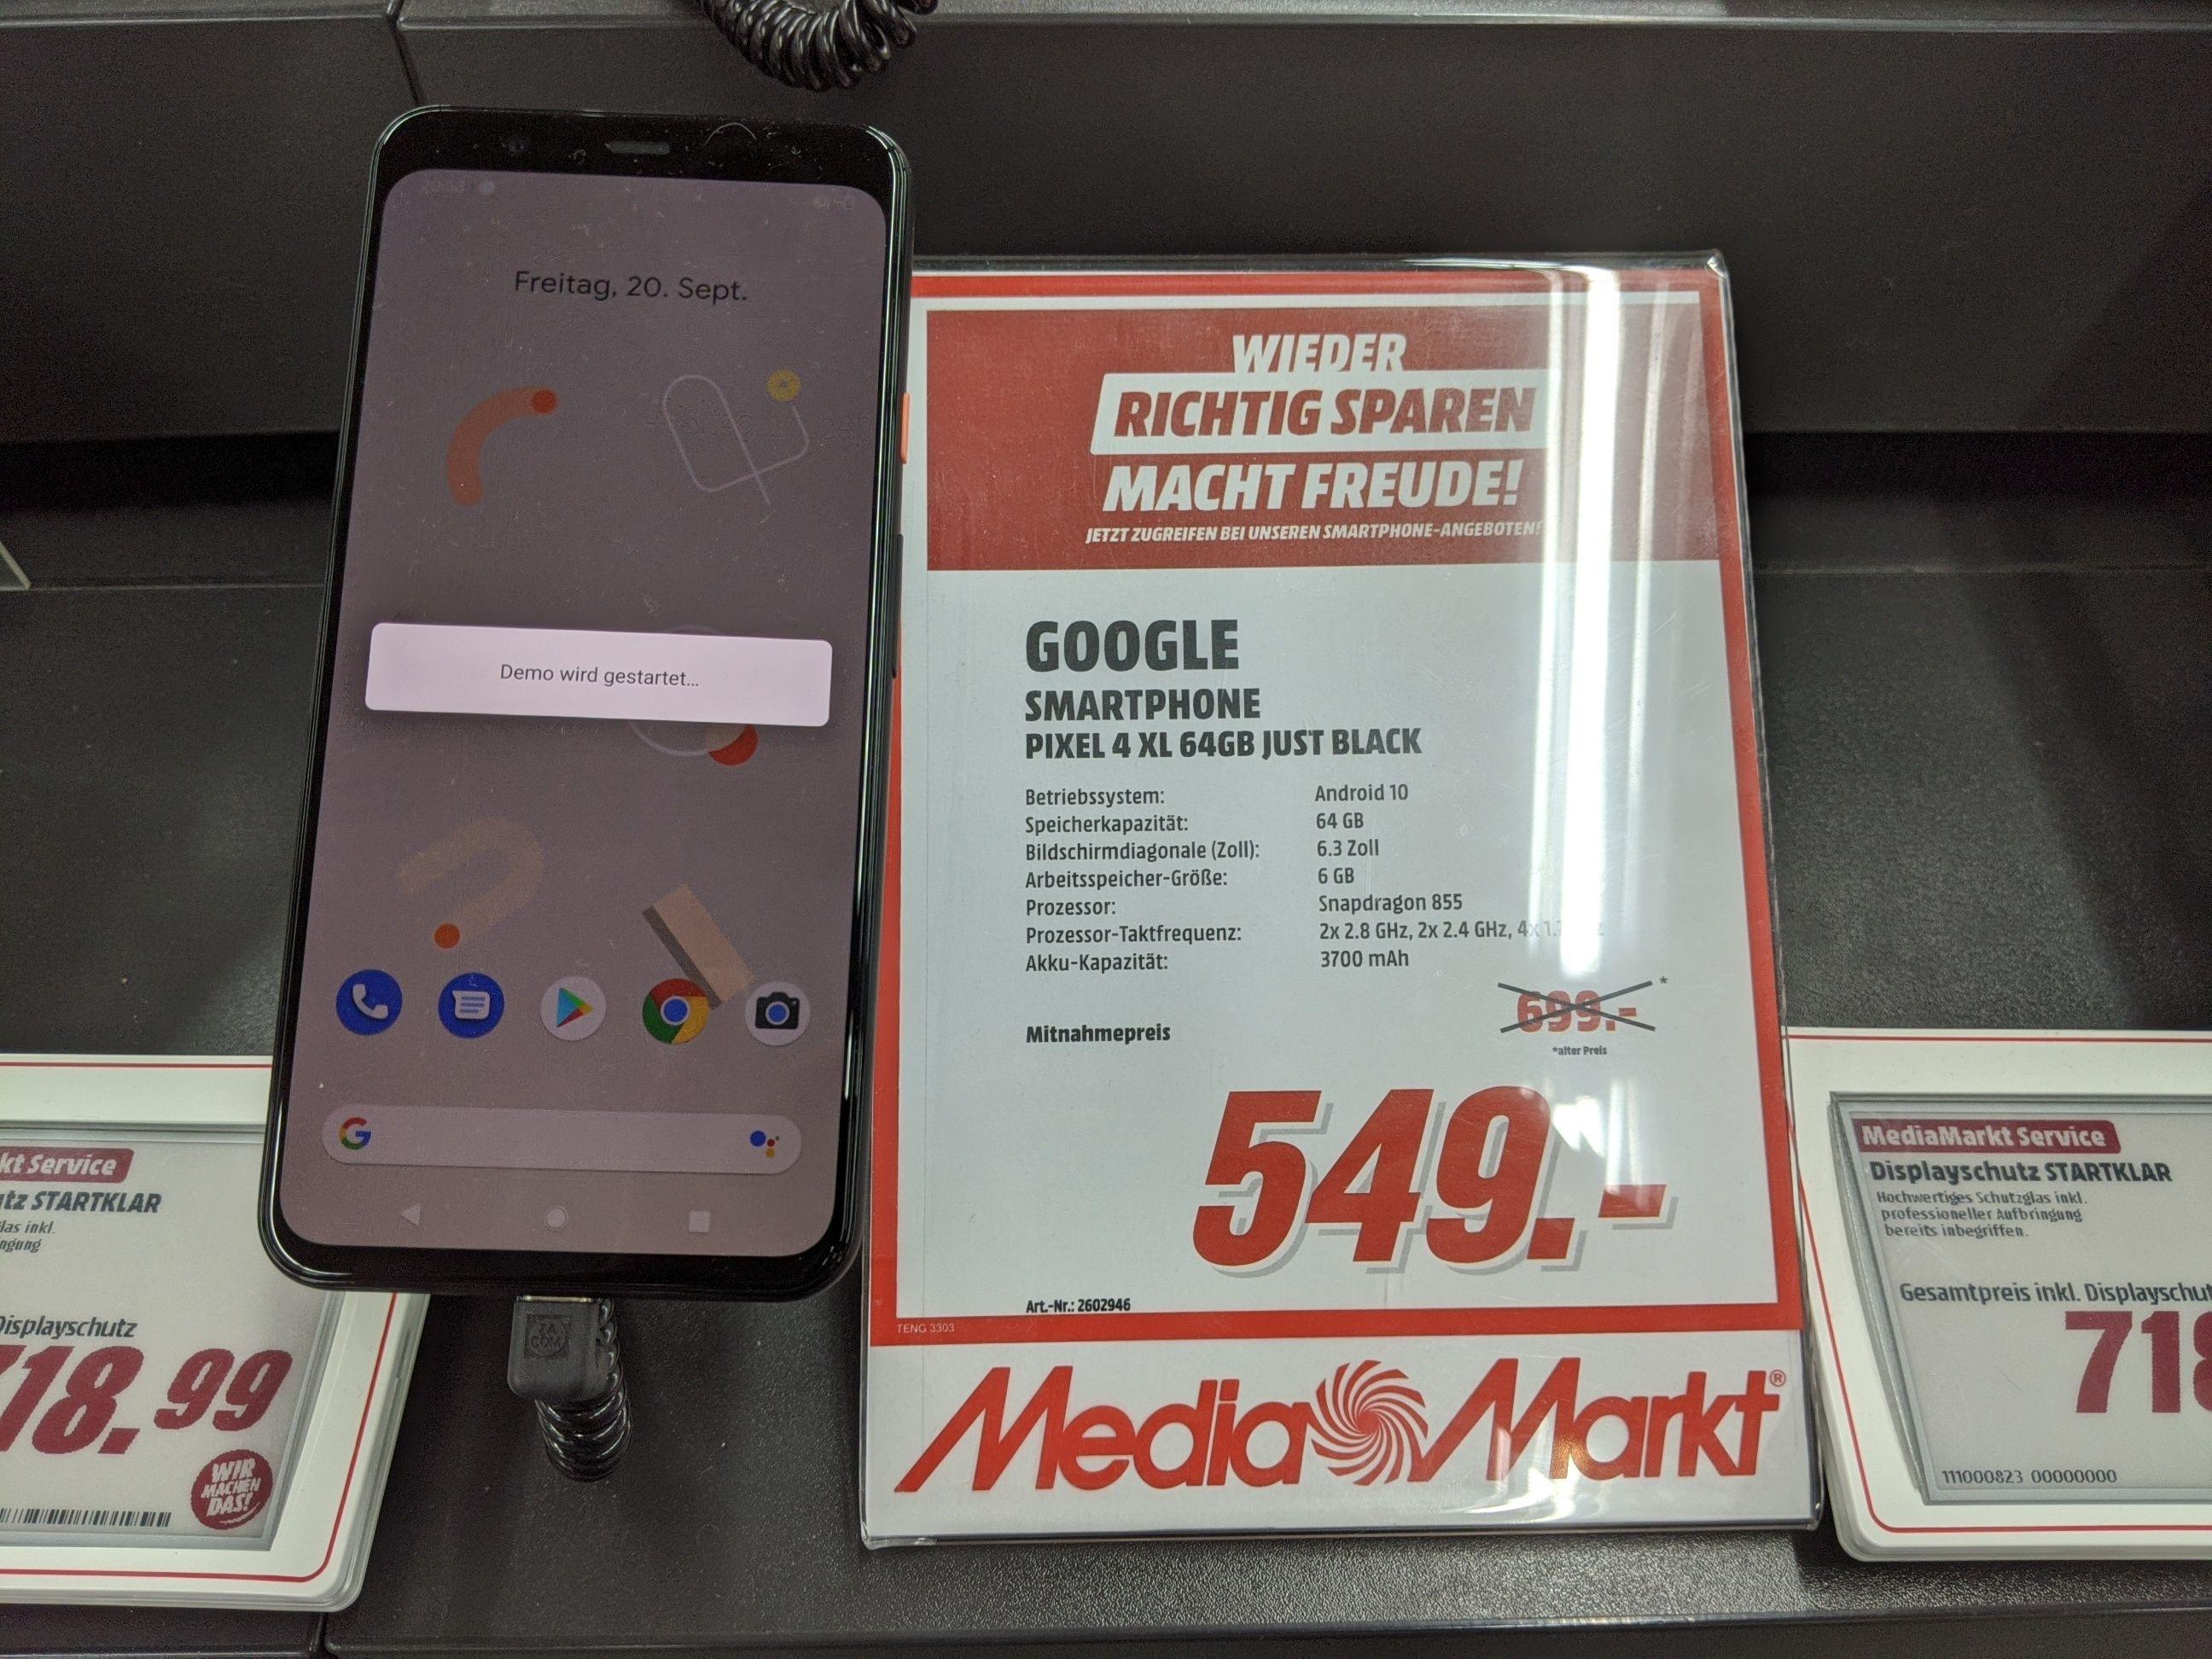 Google Pixel 4 XL 64 GB Lokal Media Markt 72229 Nagold